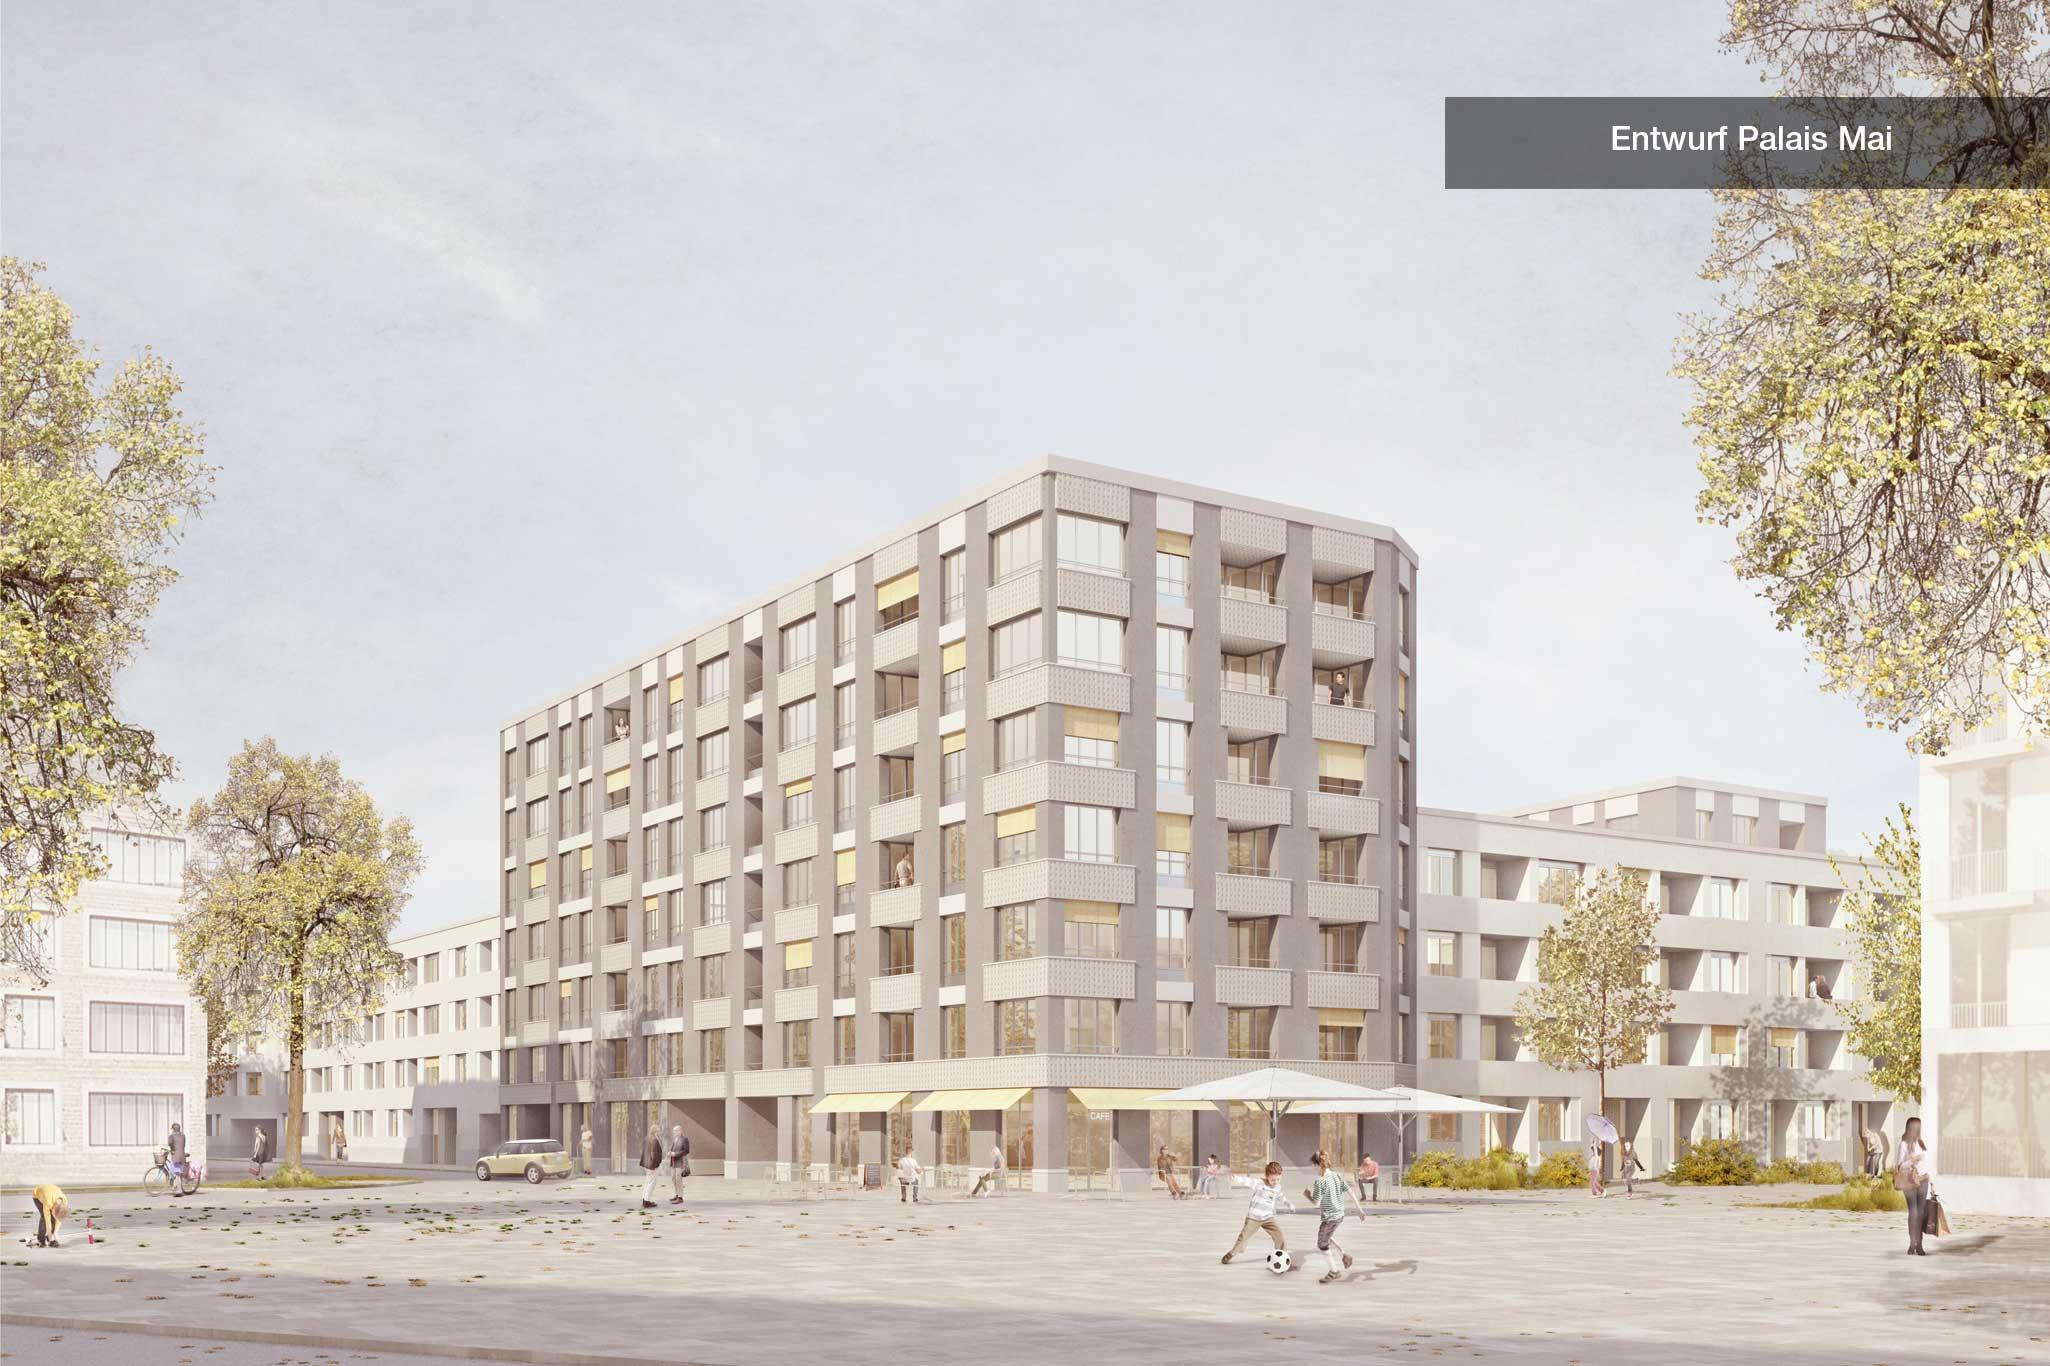 Entwurf Palaismai Platz